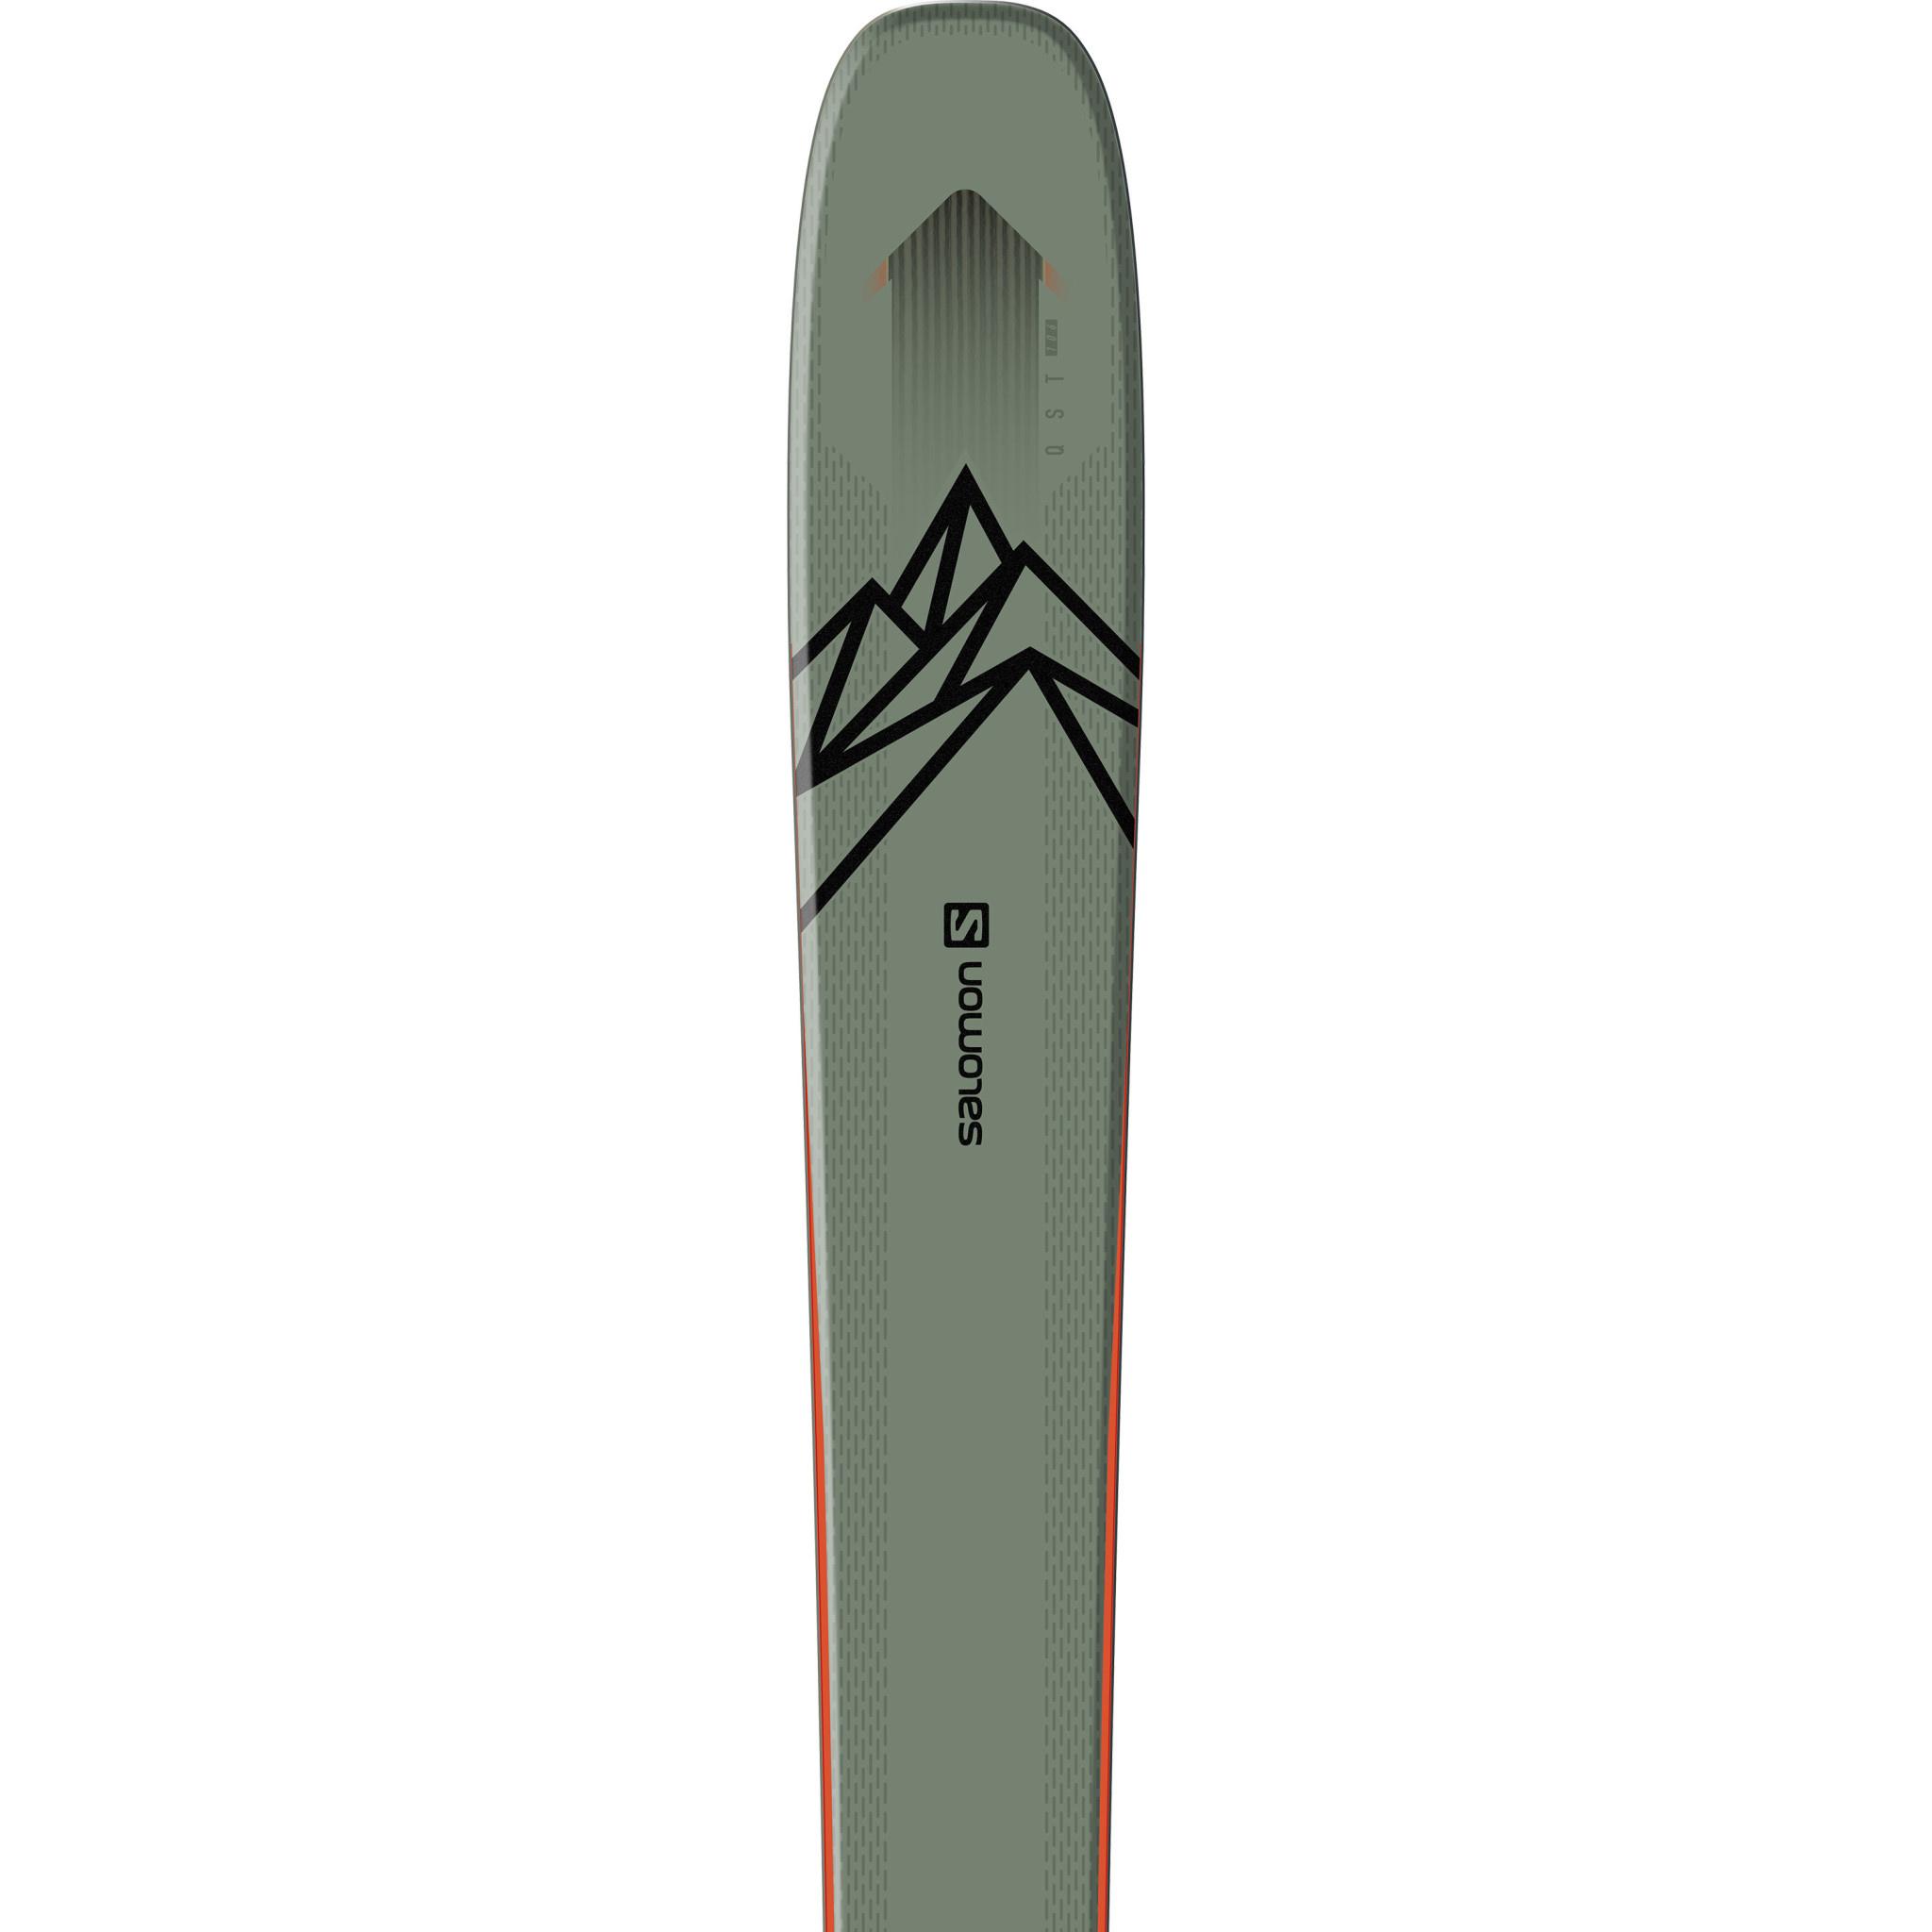 SALOMON Salomon Men's QST 106 Ski (2021)